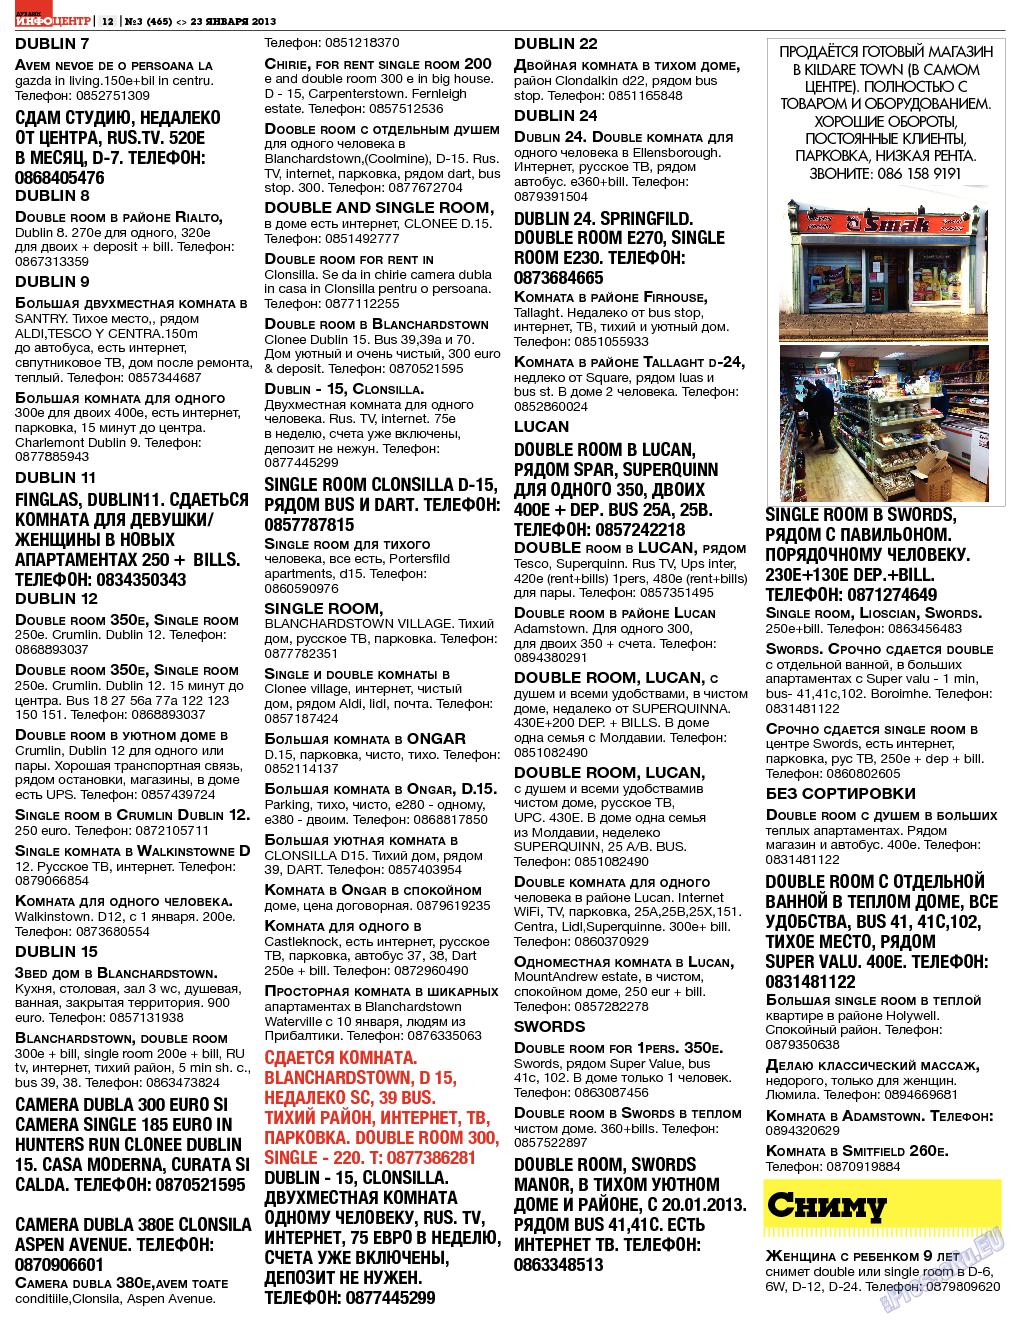 Дублин инфоцентр (газета). 2013 год, номер 3, стр. 12